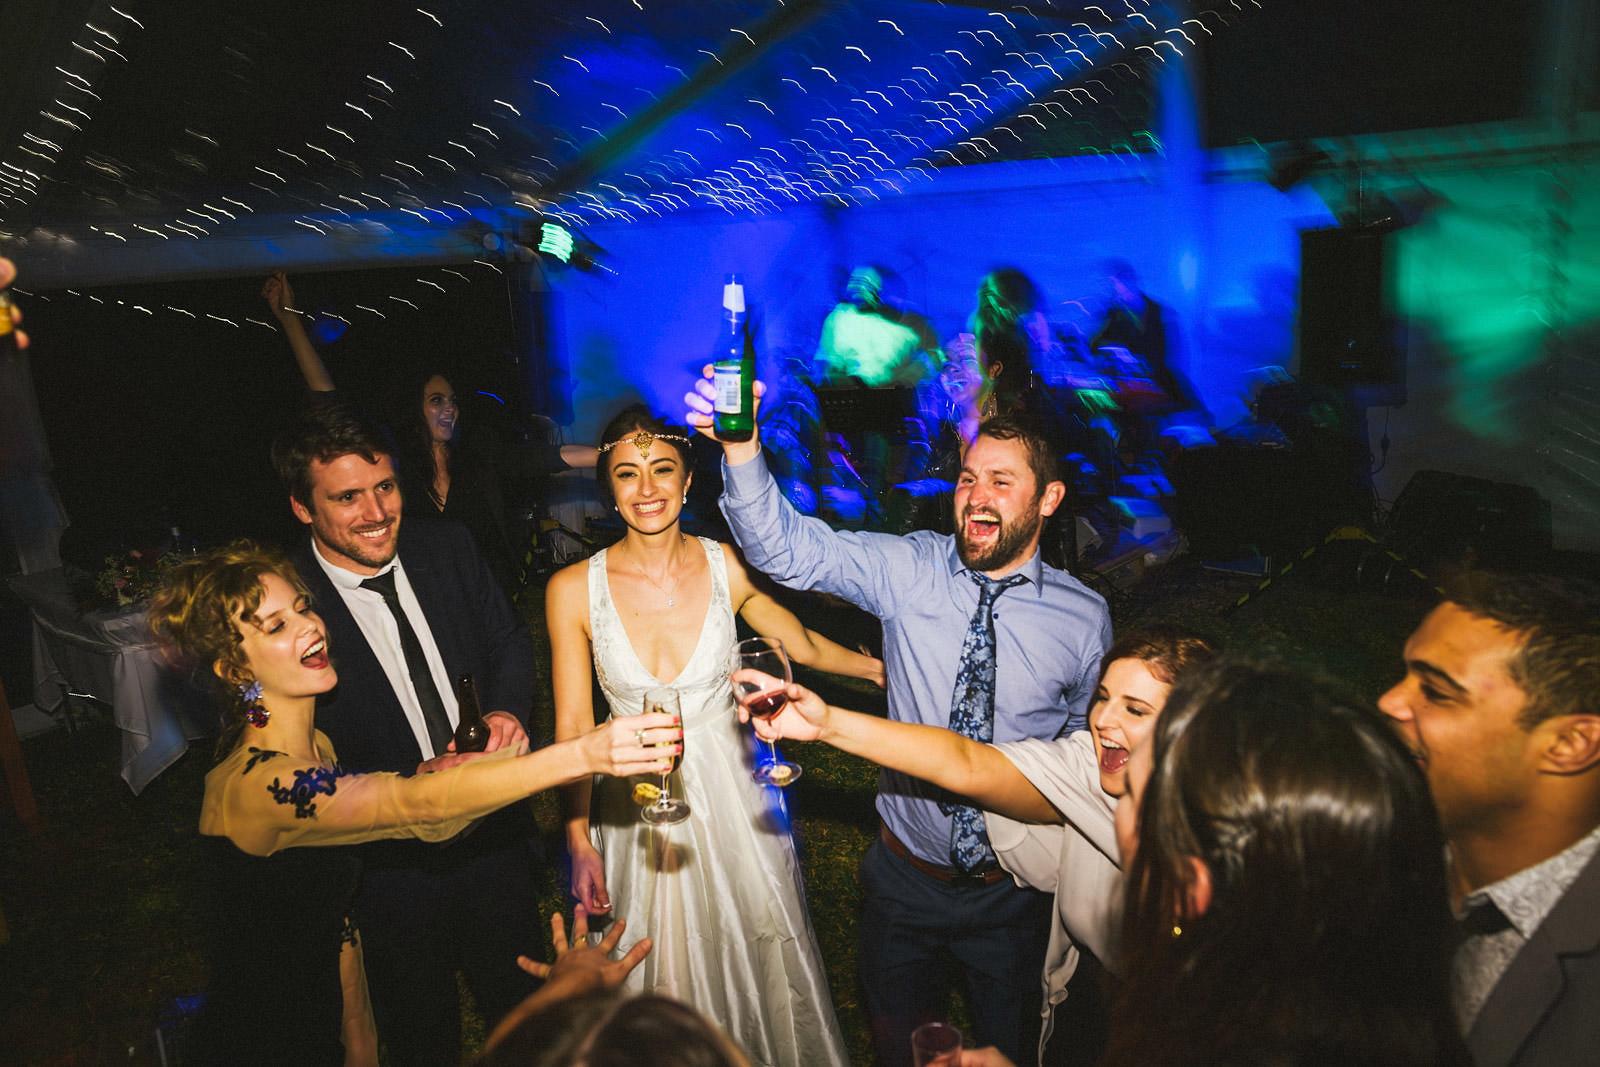 tablelands_wedding_0072